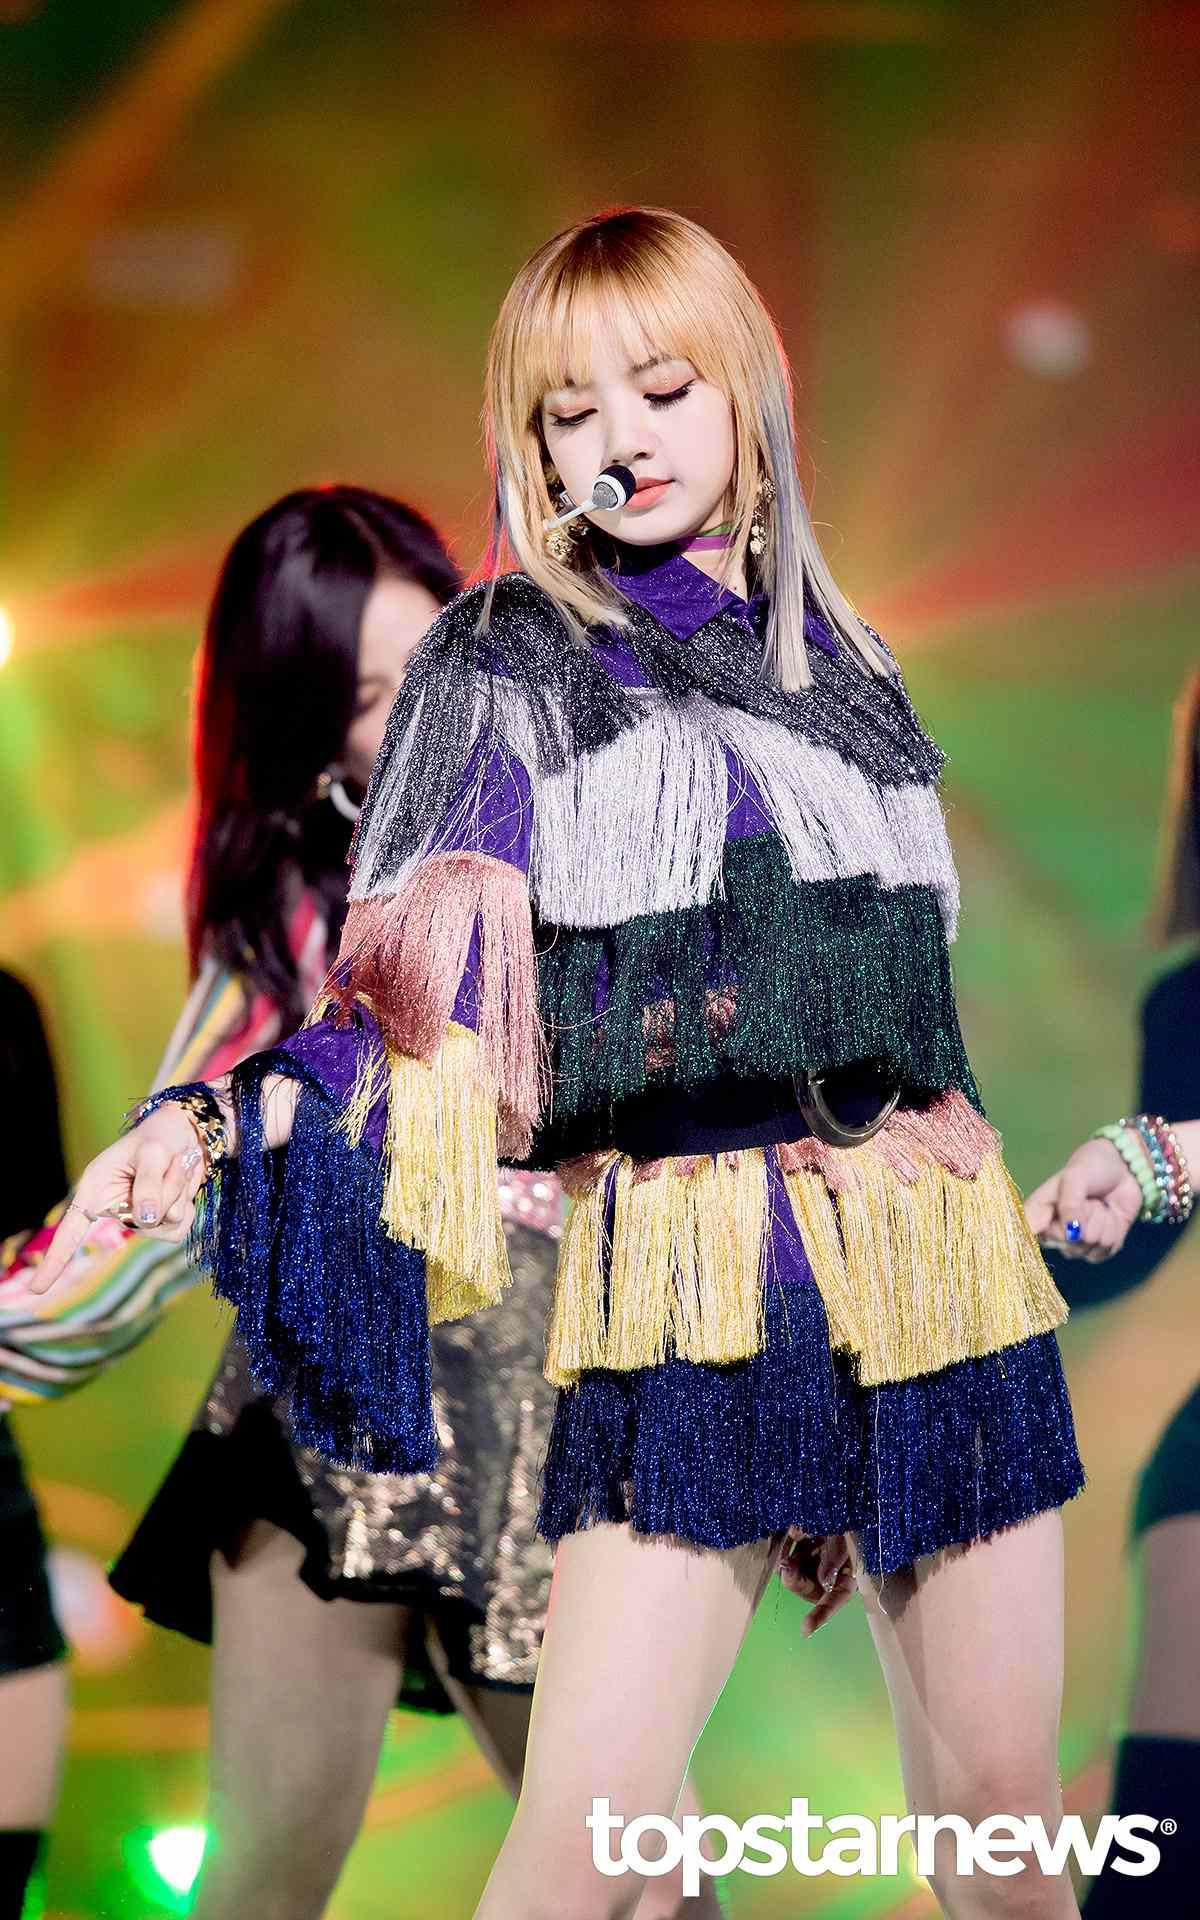 ◇Lisa: Lisa的舞台裝非常有個人特色,也不是每個人都能夠輕易駕馭的,需要高超的顏值和完美的身材線條才行。有別於舞台裝的鮮豔,其實Lisa本身私下也大多走黑色路線。